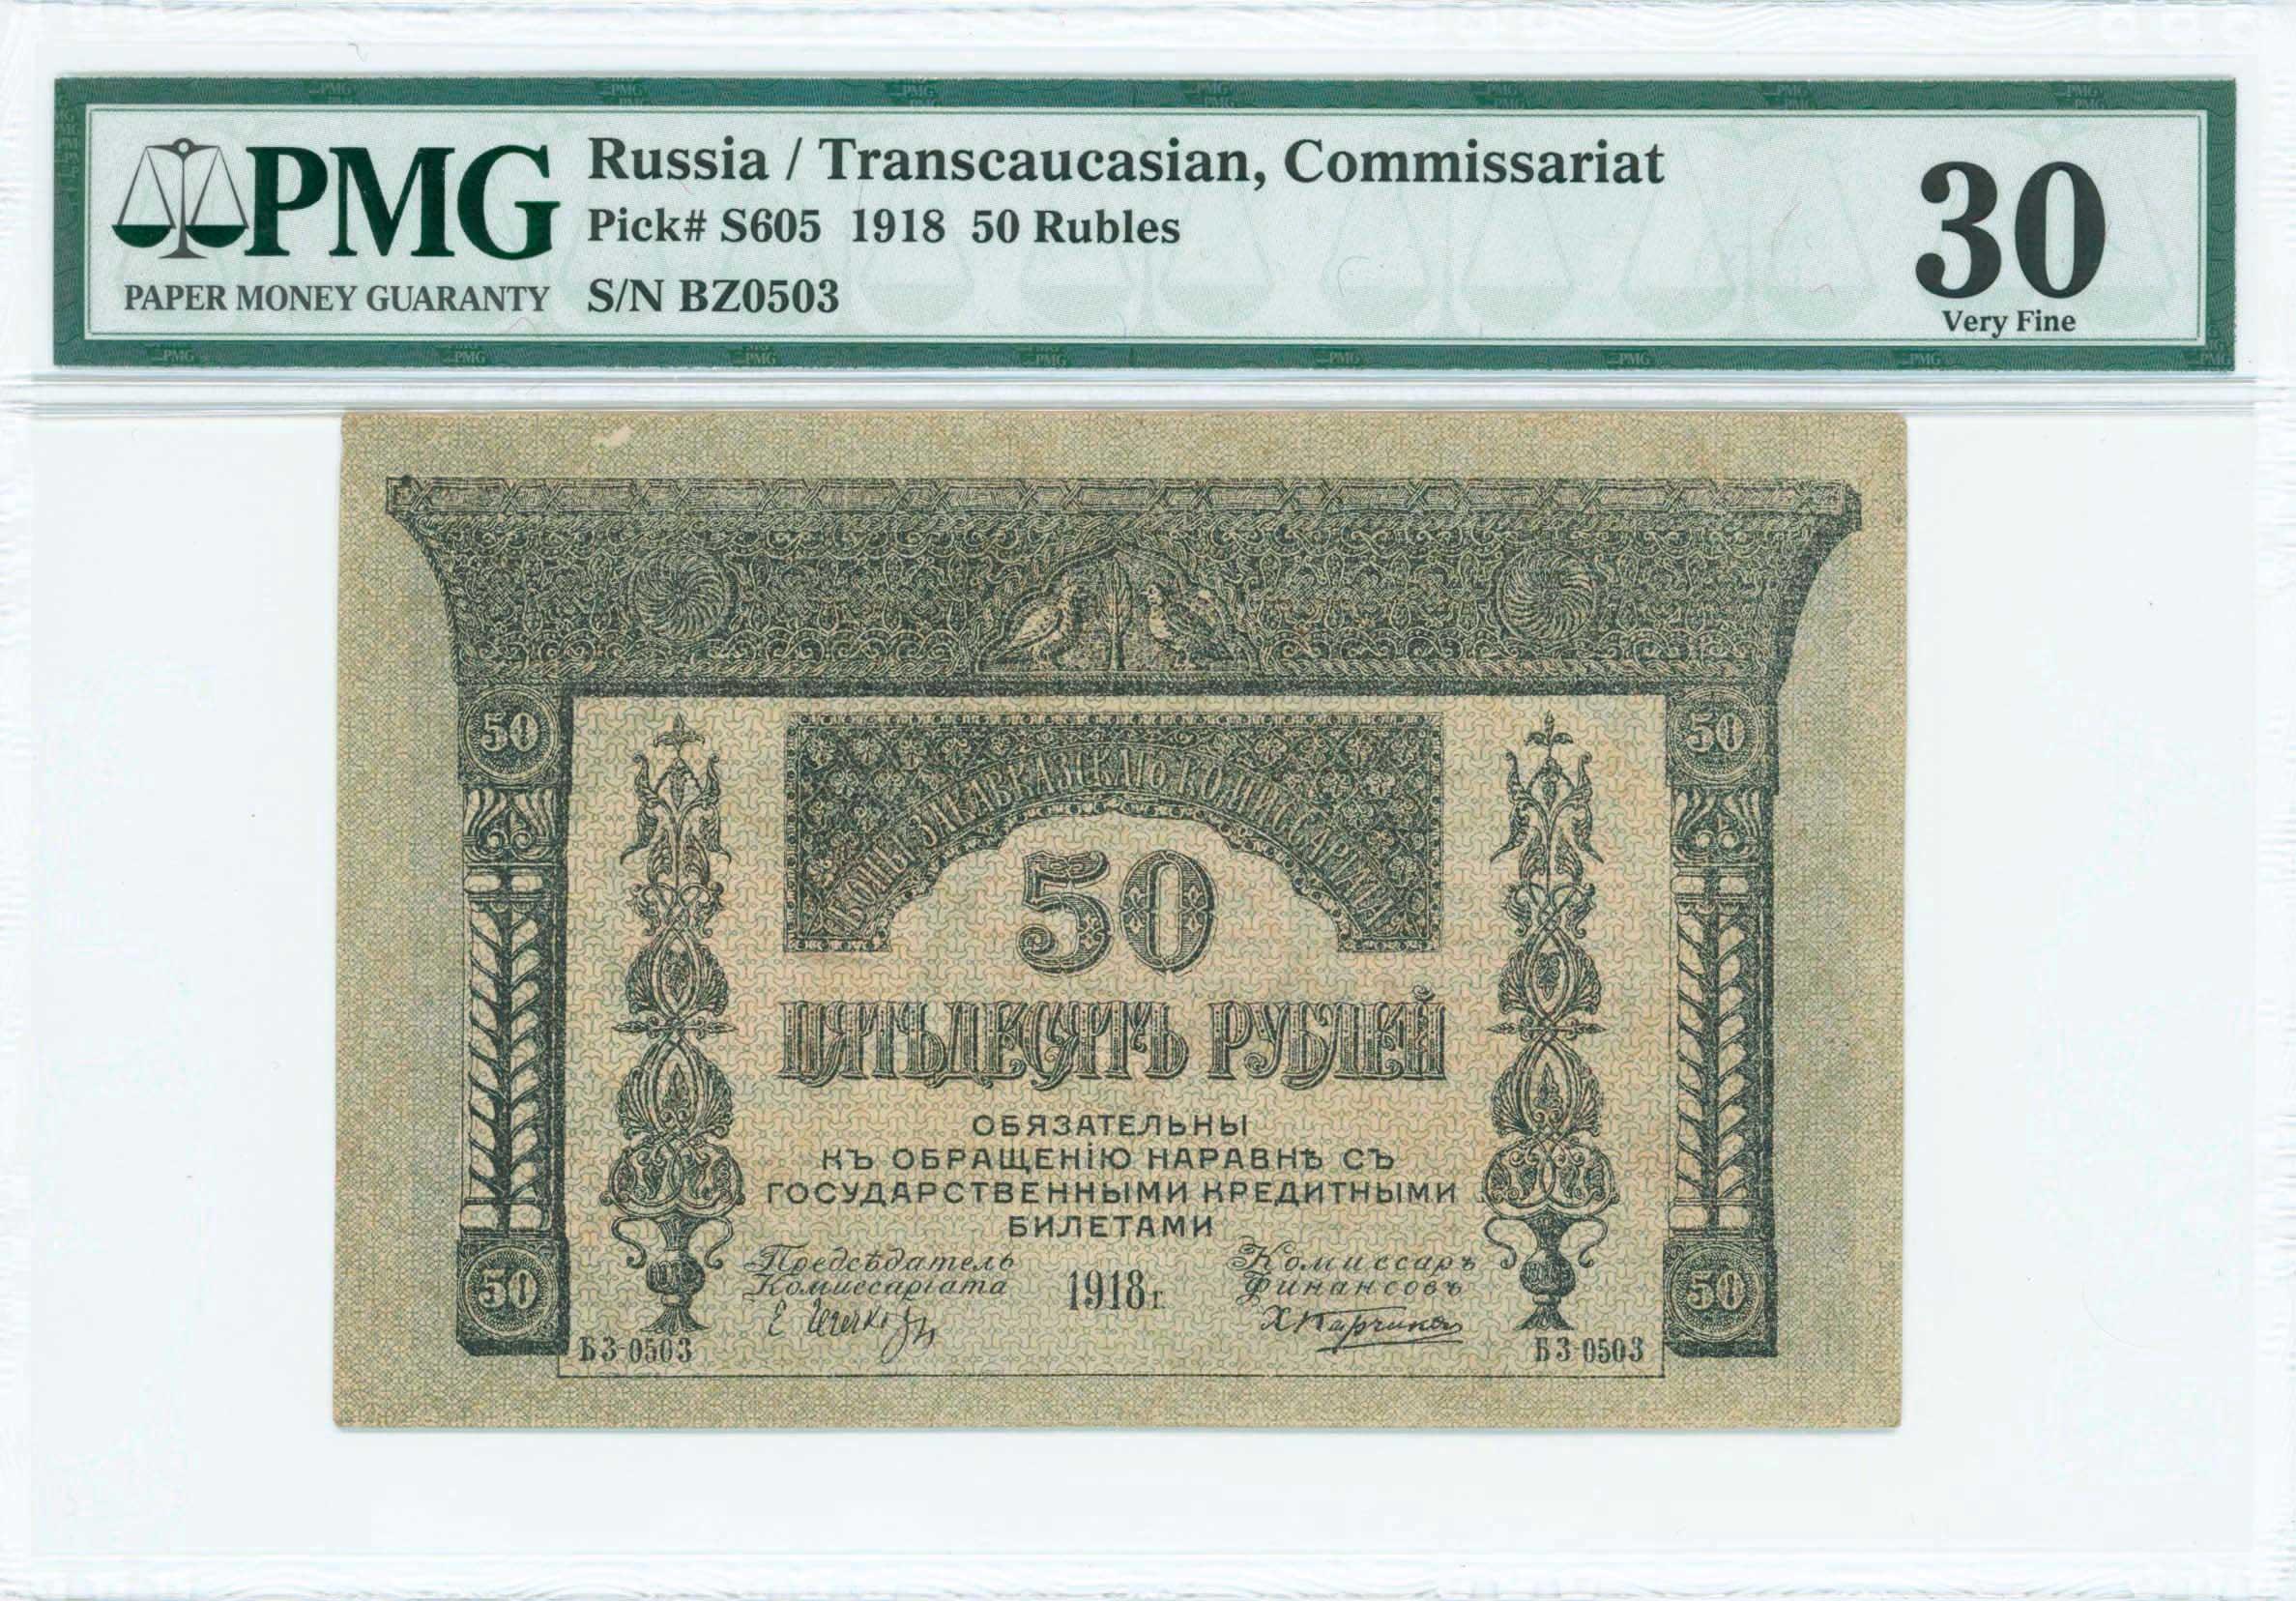 Lot 7243 - -  PAPER MONEY - BANKNOTES BANKNOTES OF EUROPEAN COUNTRIES -  A. Karamitsos Public & Live Internet Auction 671 (Part B)